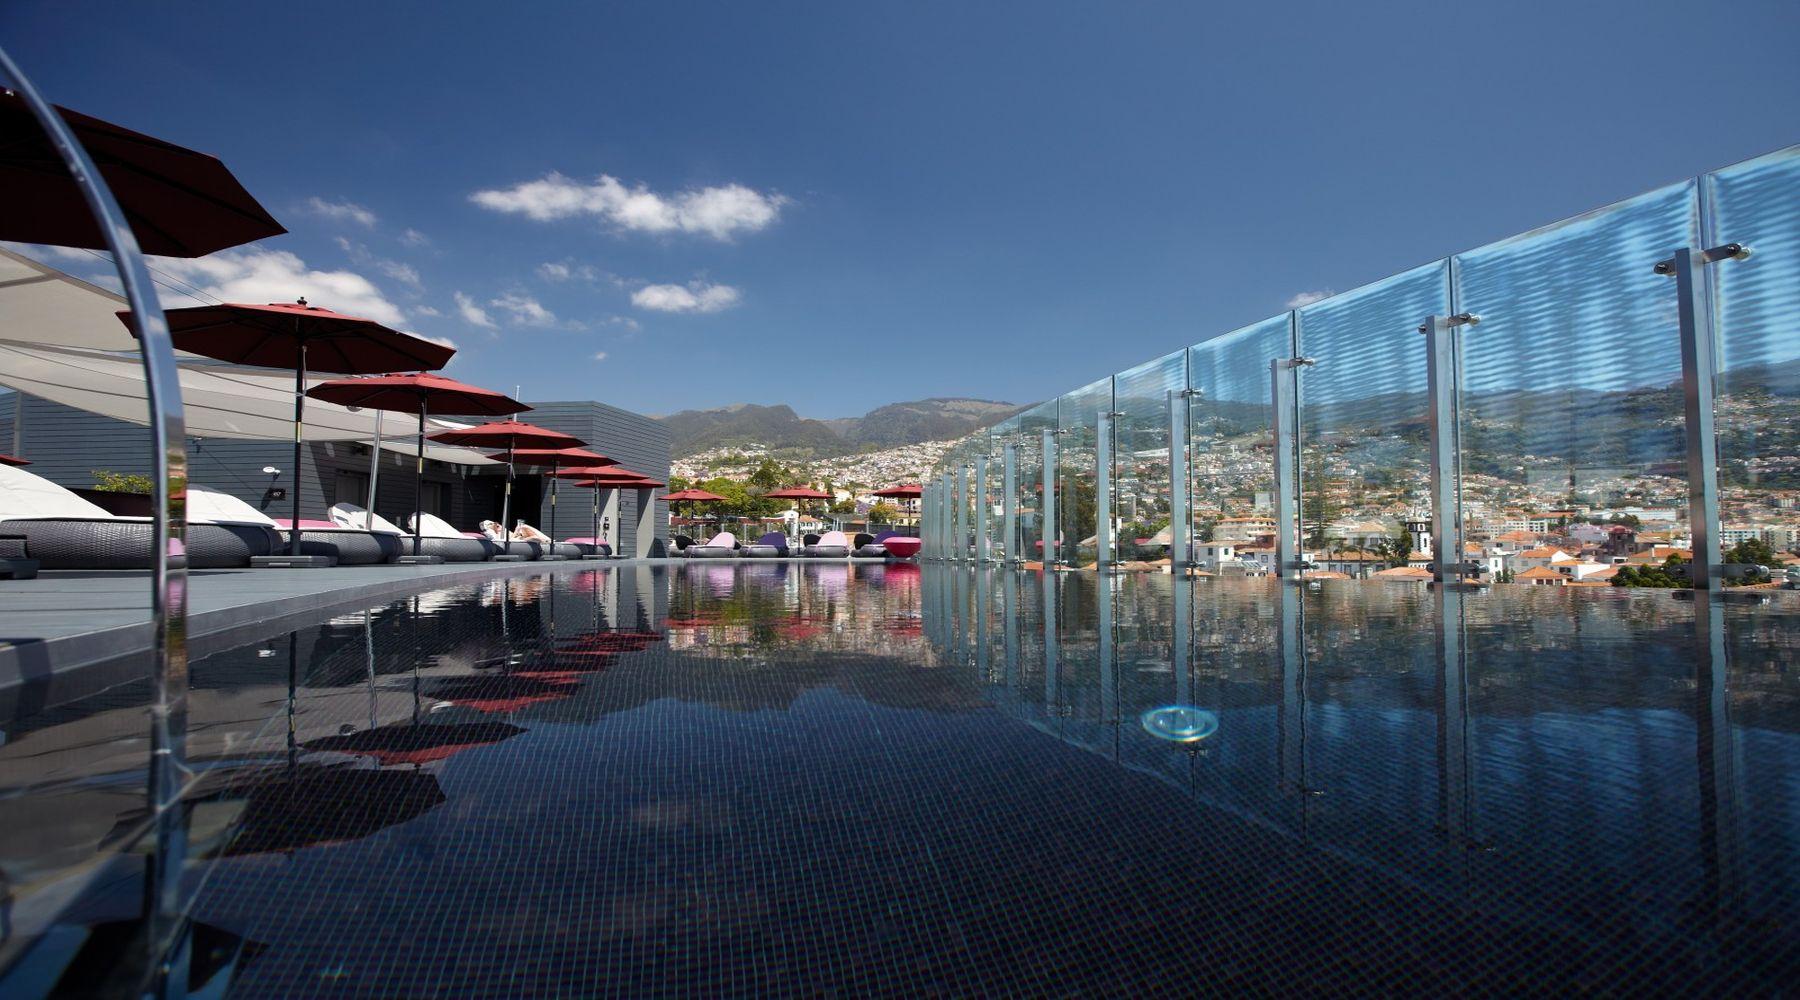 Hotel The Vine, Madera